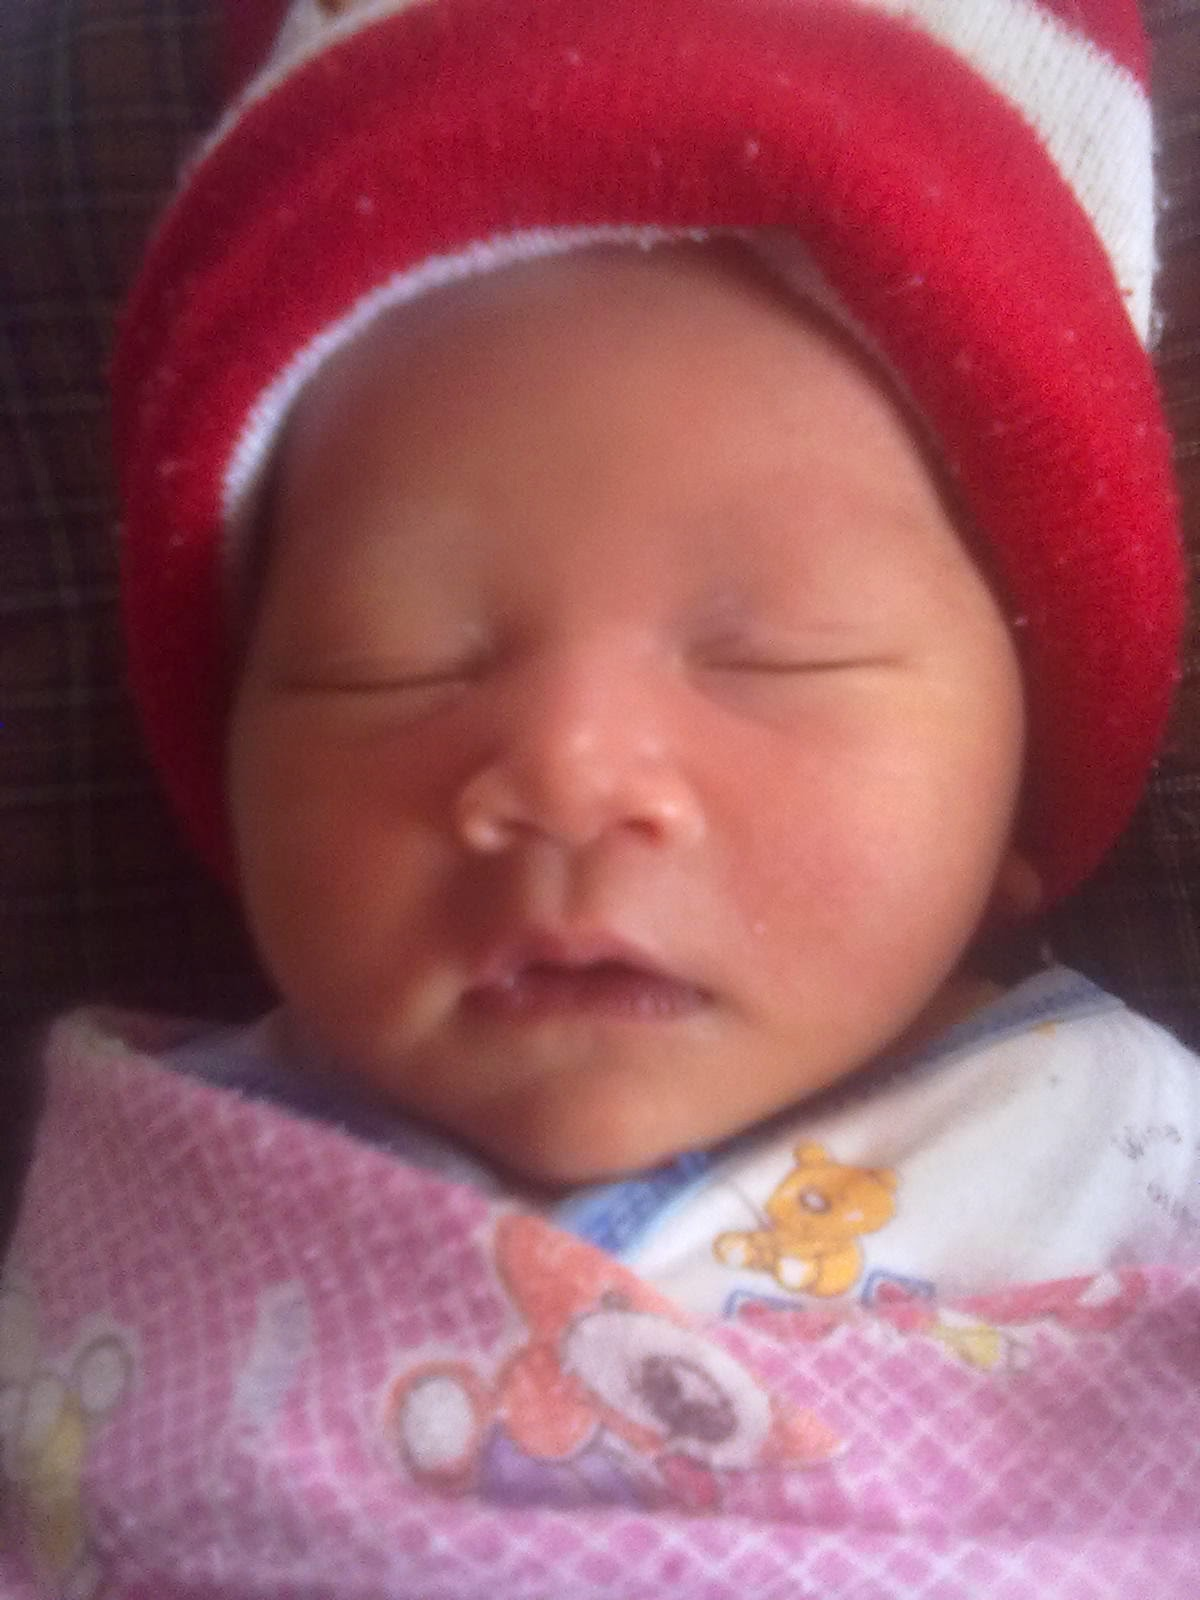 Fhoto Bayi Dan Bayi Lucu Dan Nama Anak Bagus Lucu Cahaya Kehidupan